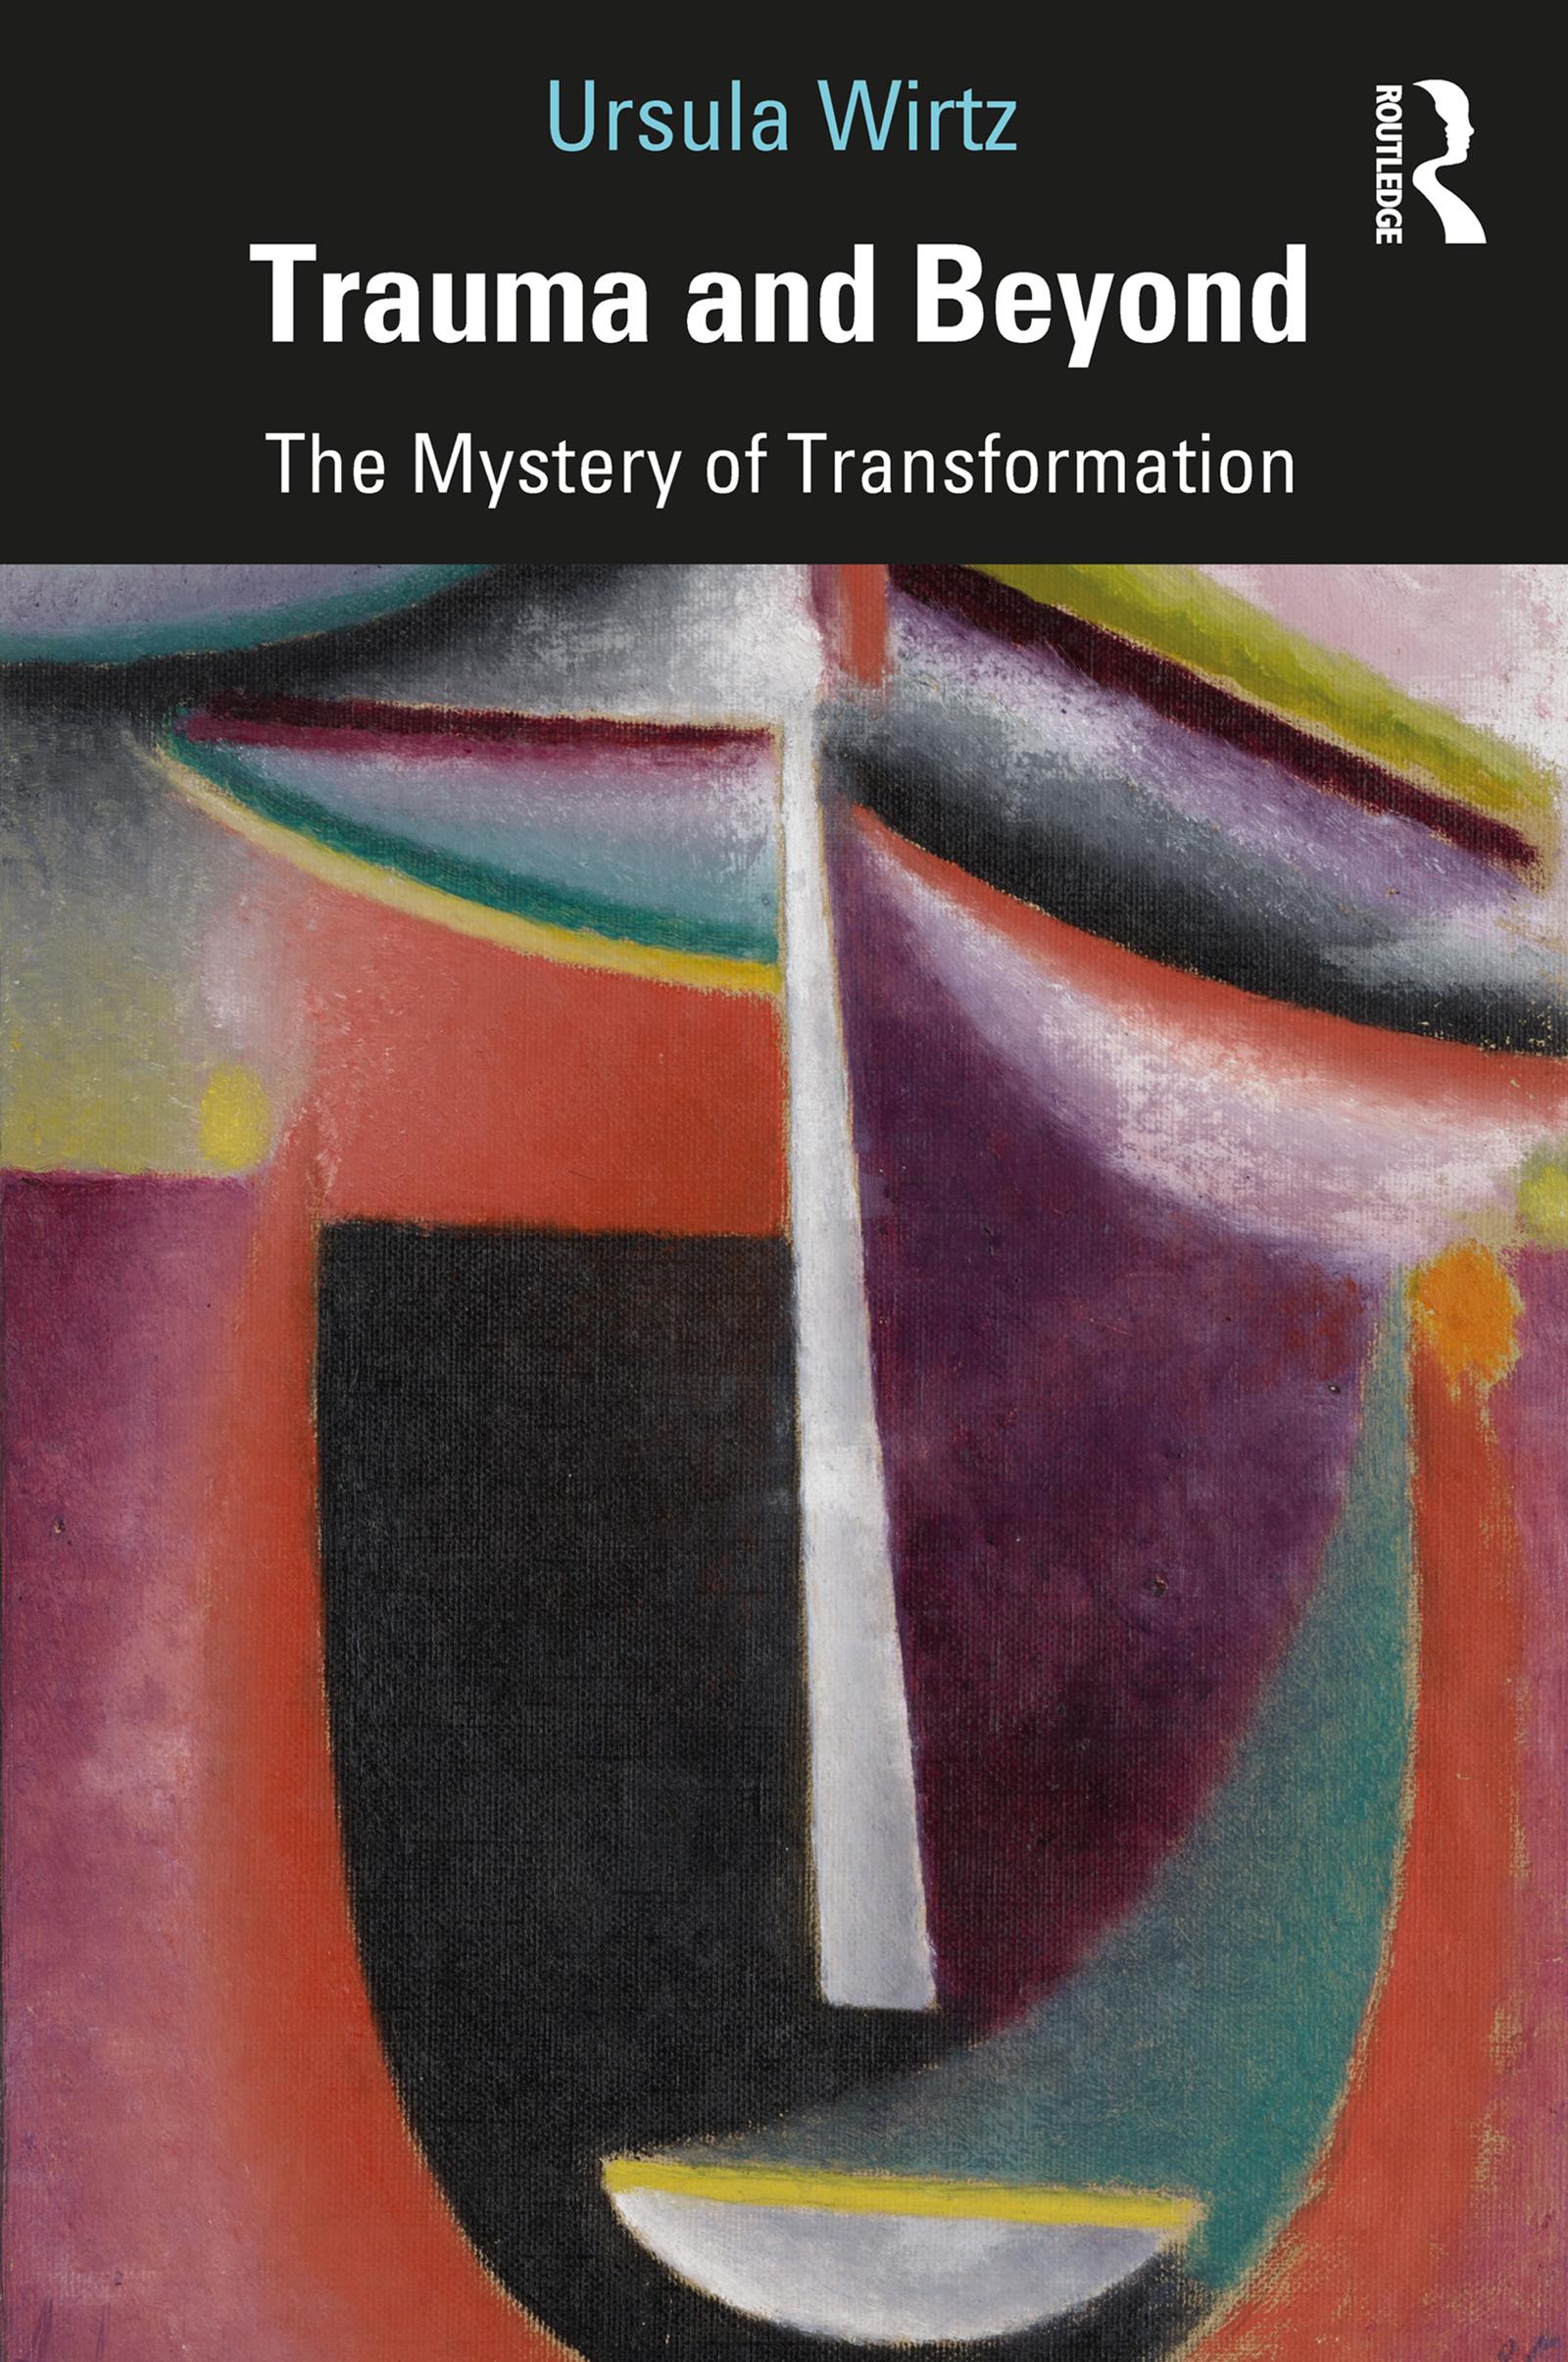 Trauma as a Spiritual Experience